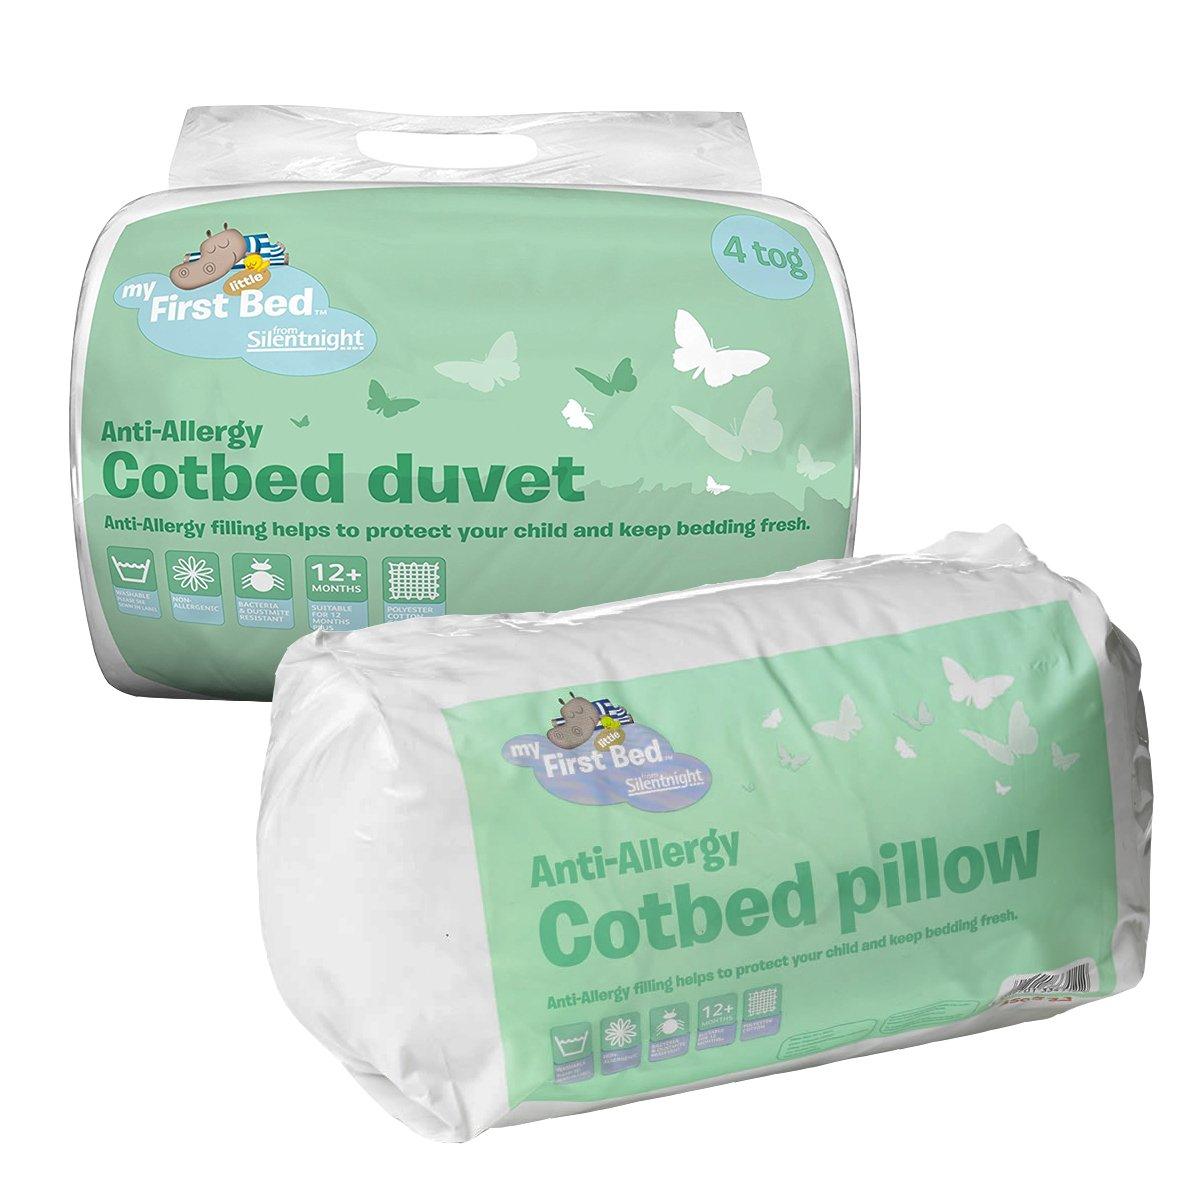 Silentnight Anti-Allergy Cot Bed Set - 4.0 tog Duvet & Pillow - Machine Washable